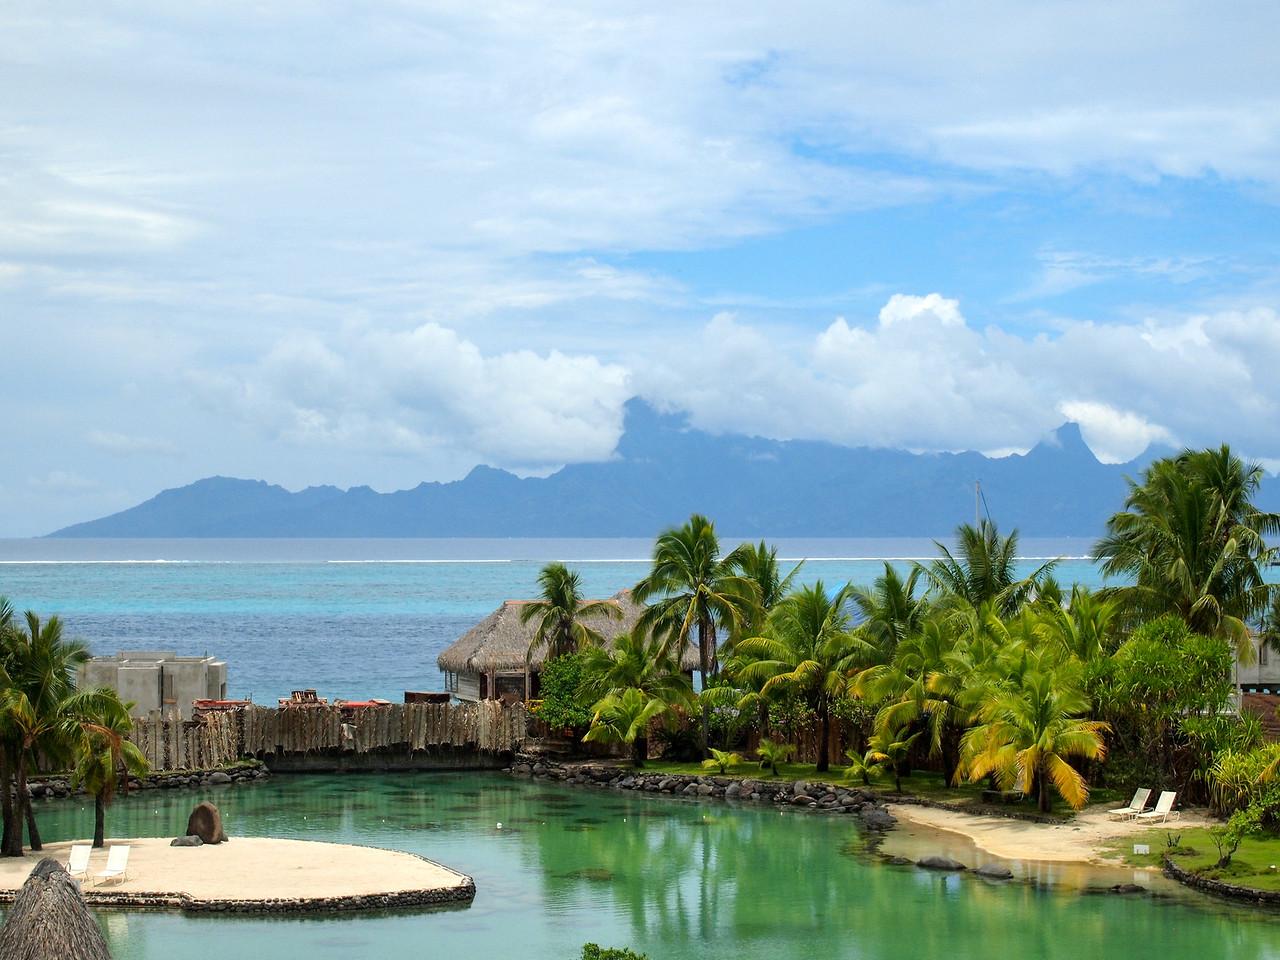 View from the InterContinental Tahiti